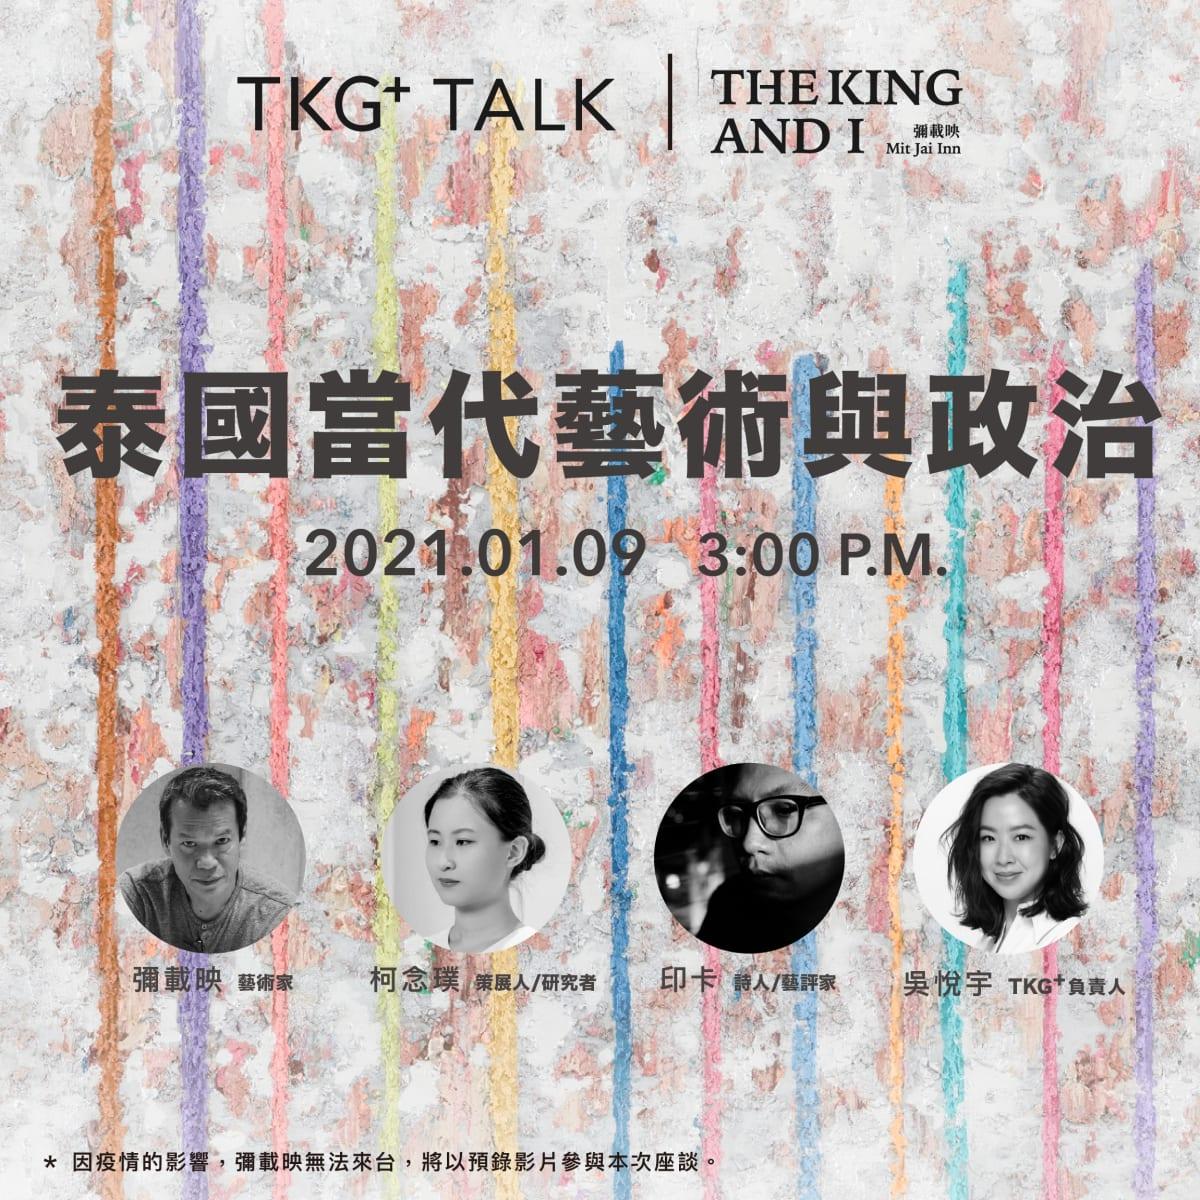 TKG+ 講座 │ The King and I - 泰國當代藝術與政治